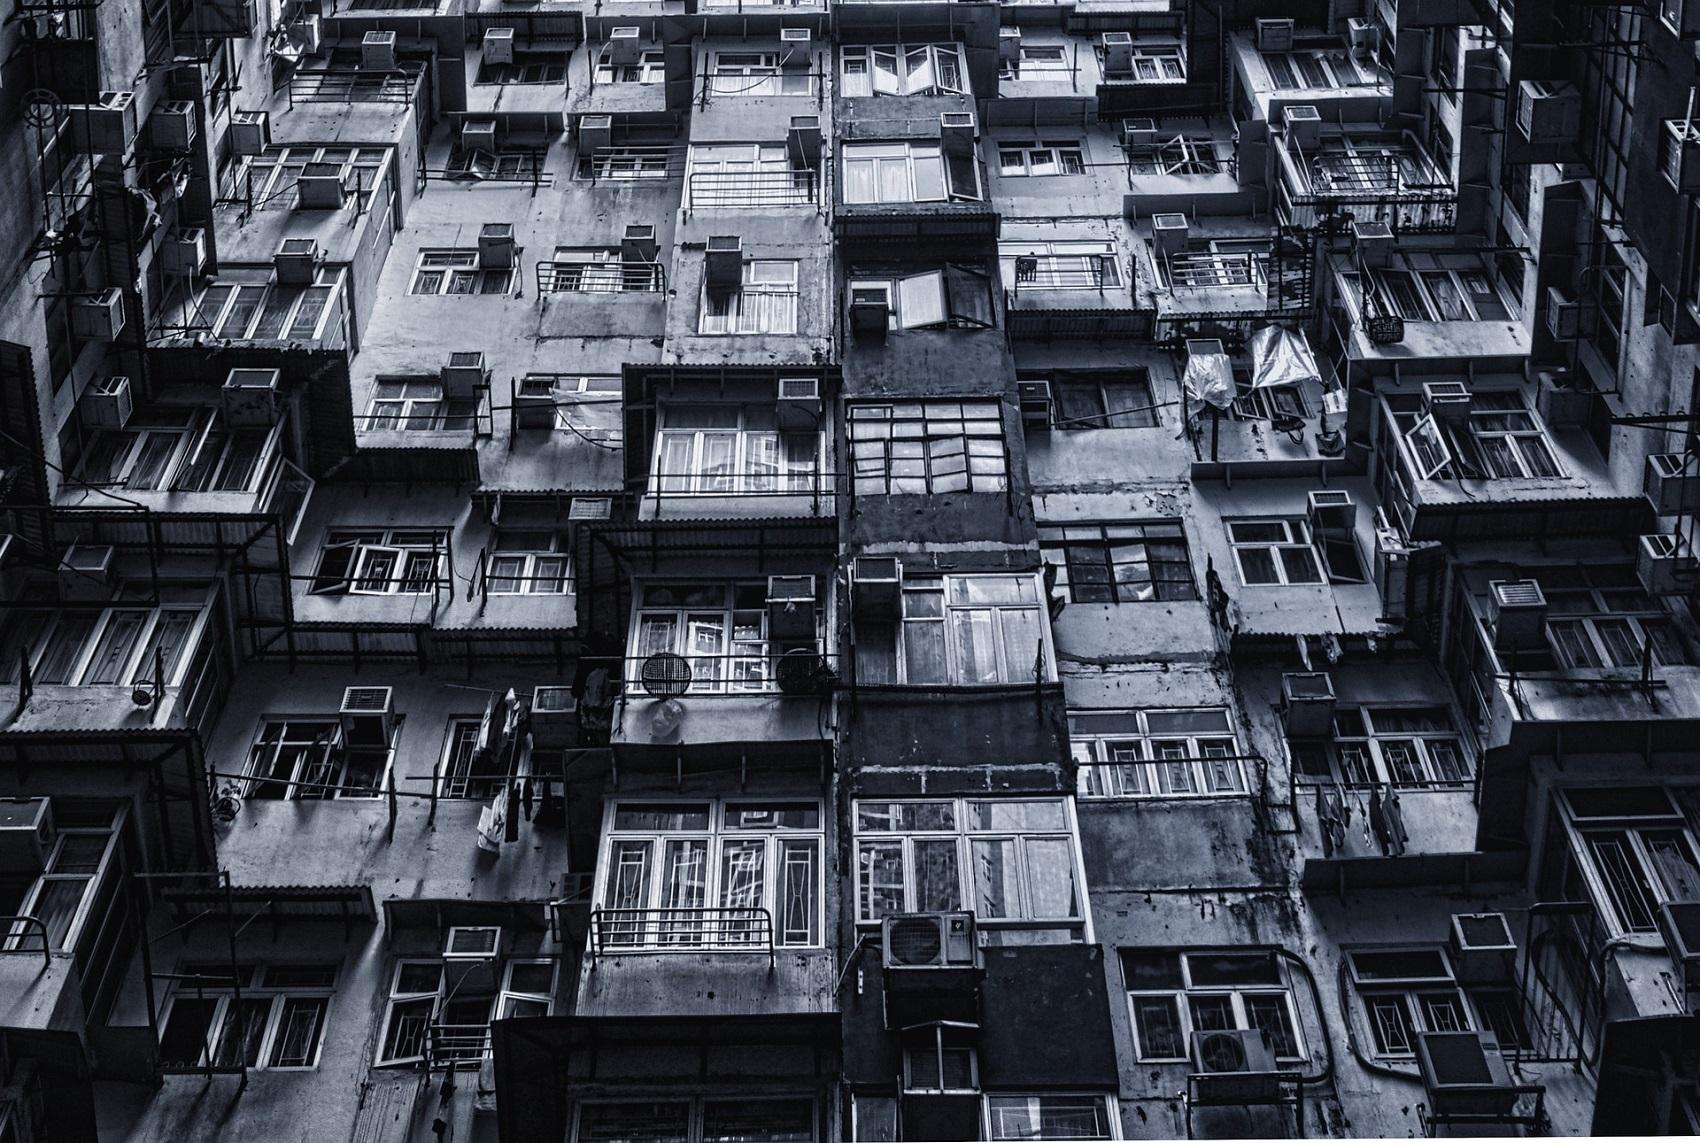 Hongkong gdzie nocleg - jaki hotel?